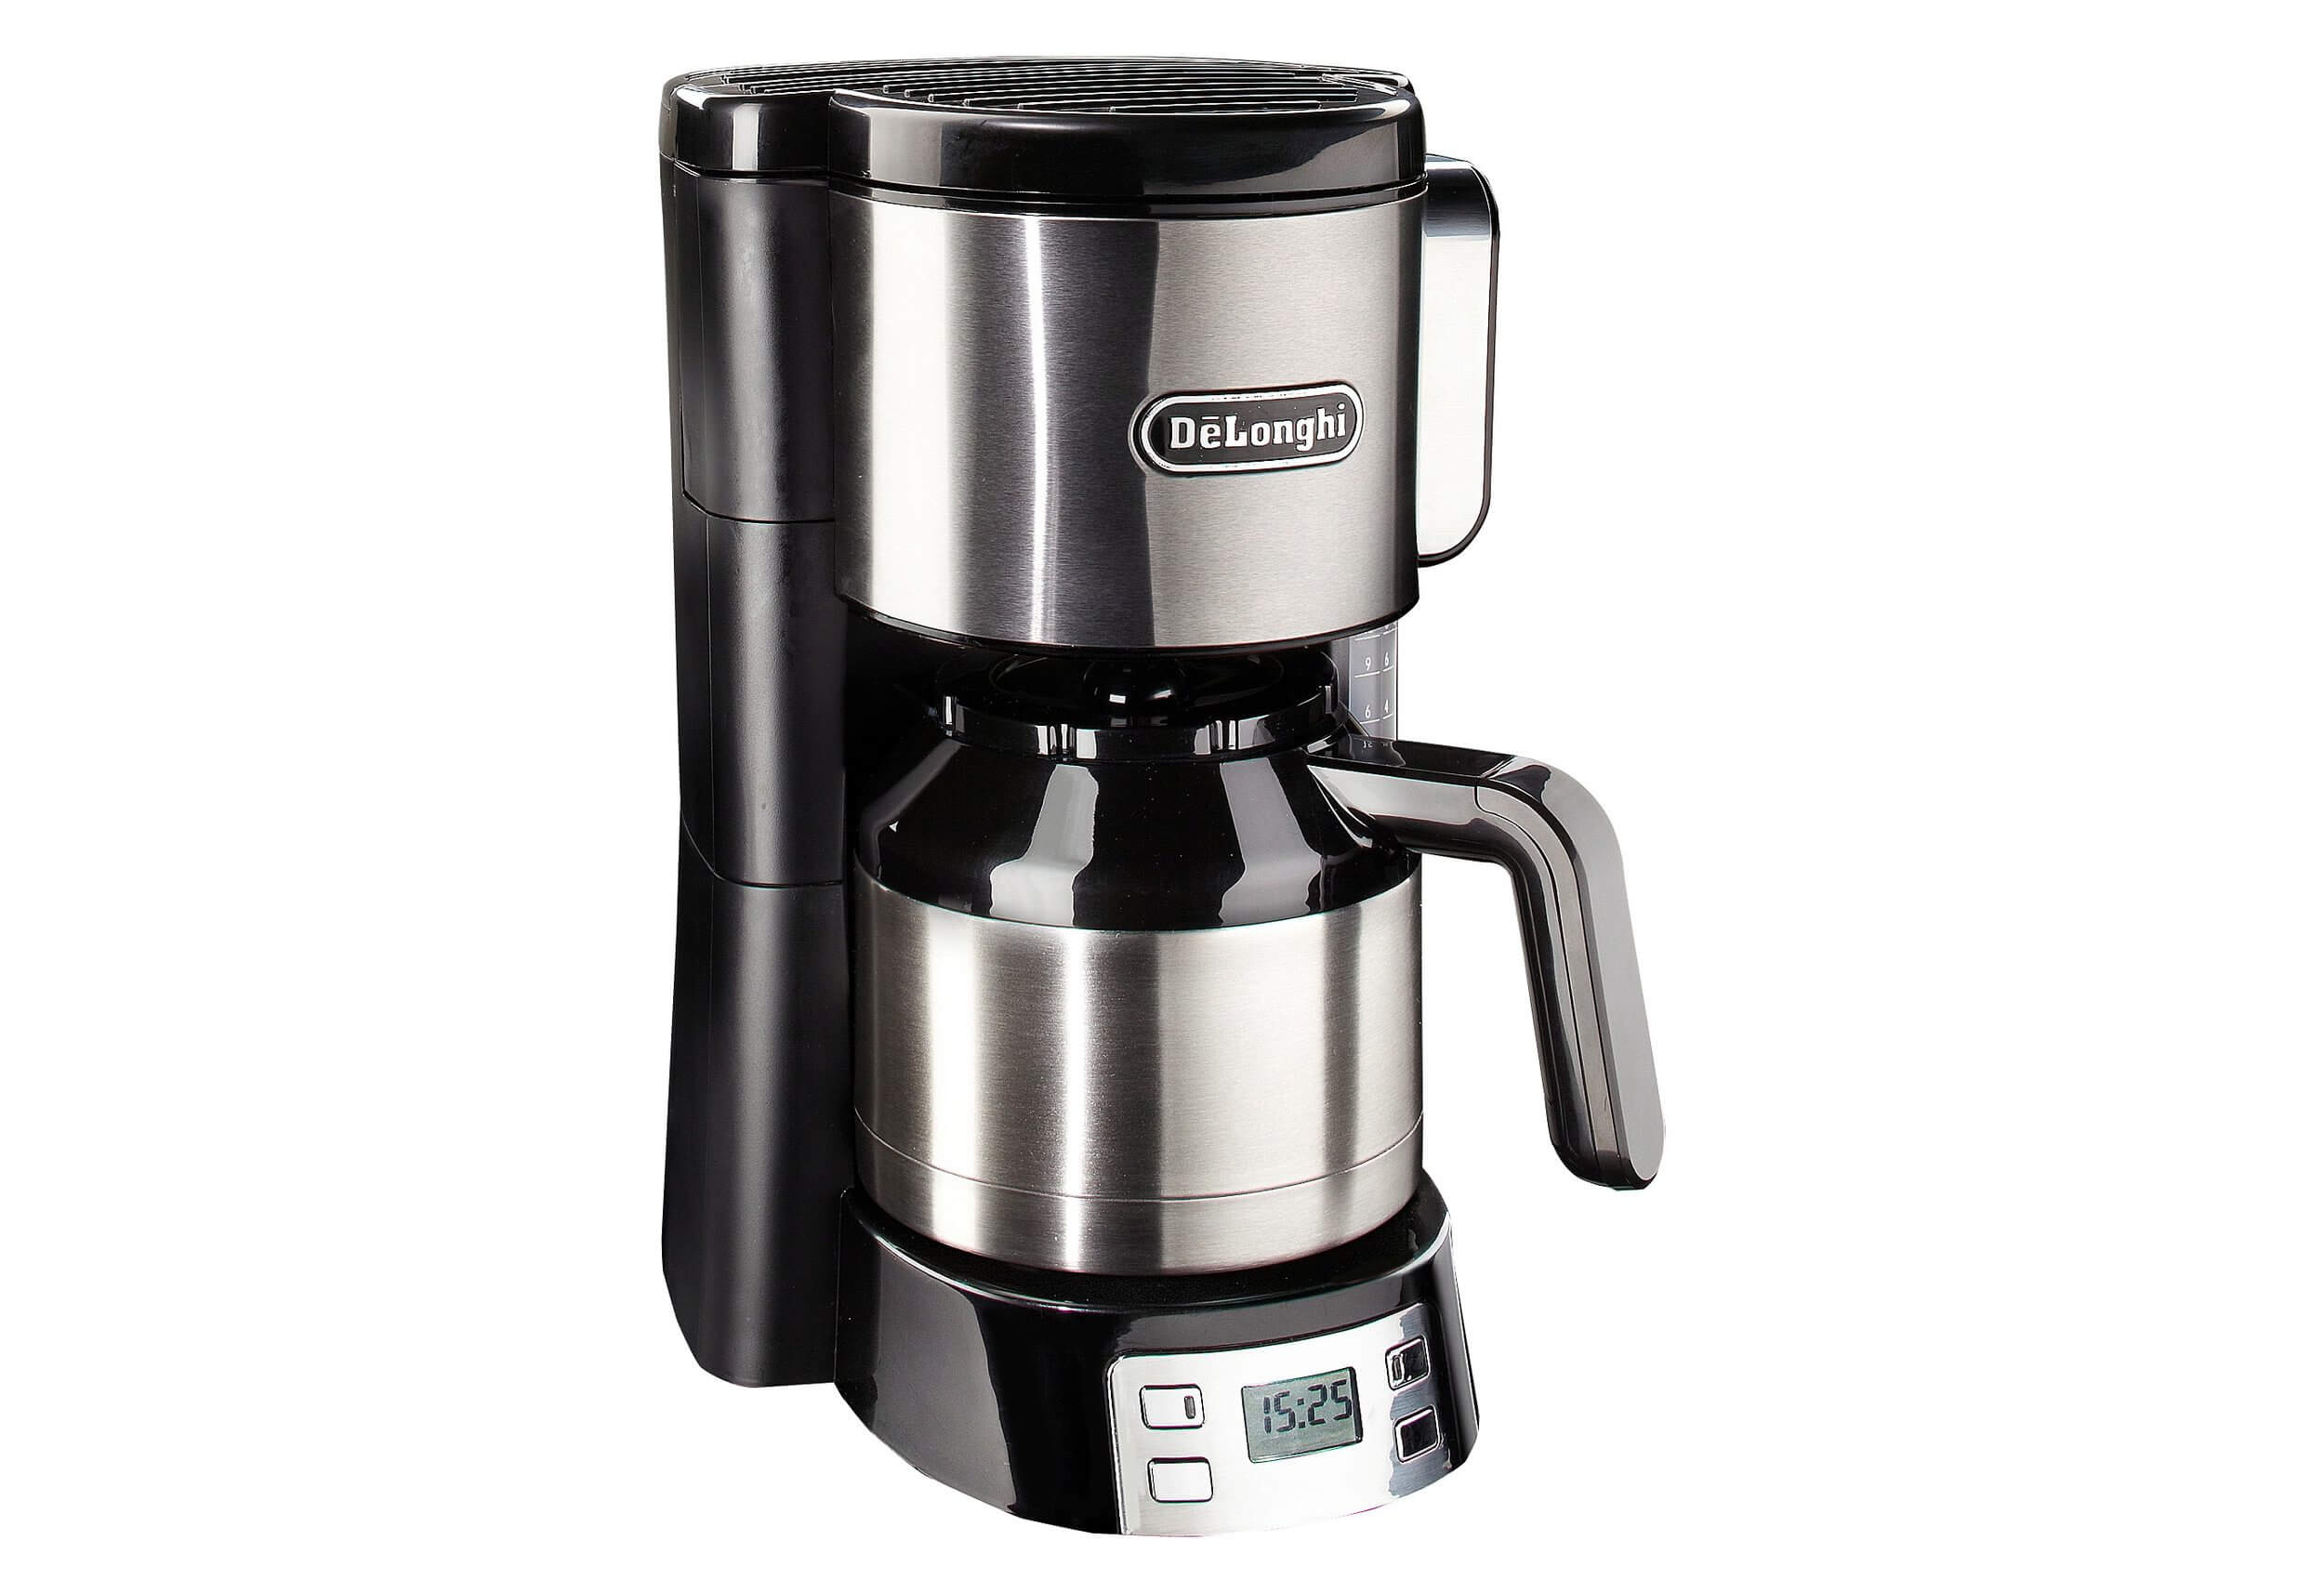 main images قهوه ساز دلونگی ایتالیا De'Longhi Filterkaffeemaschine ICM15750